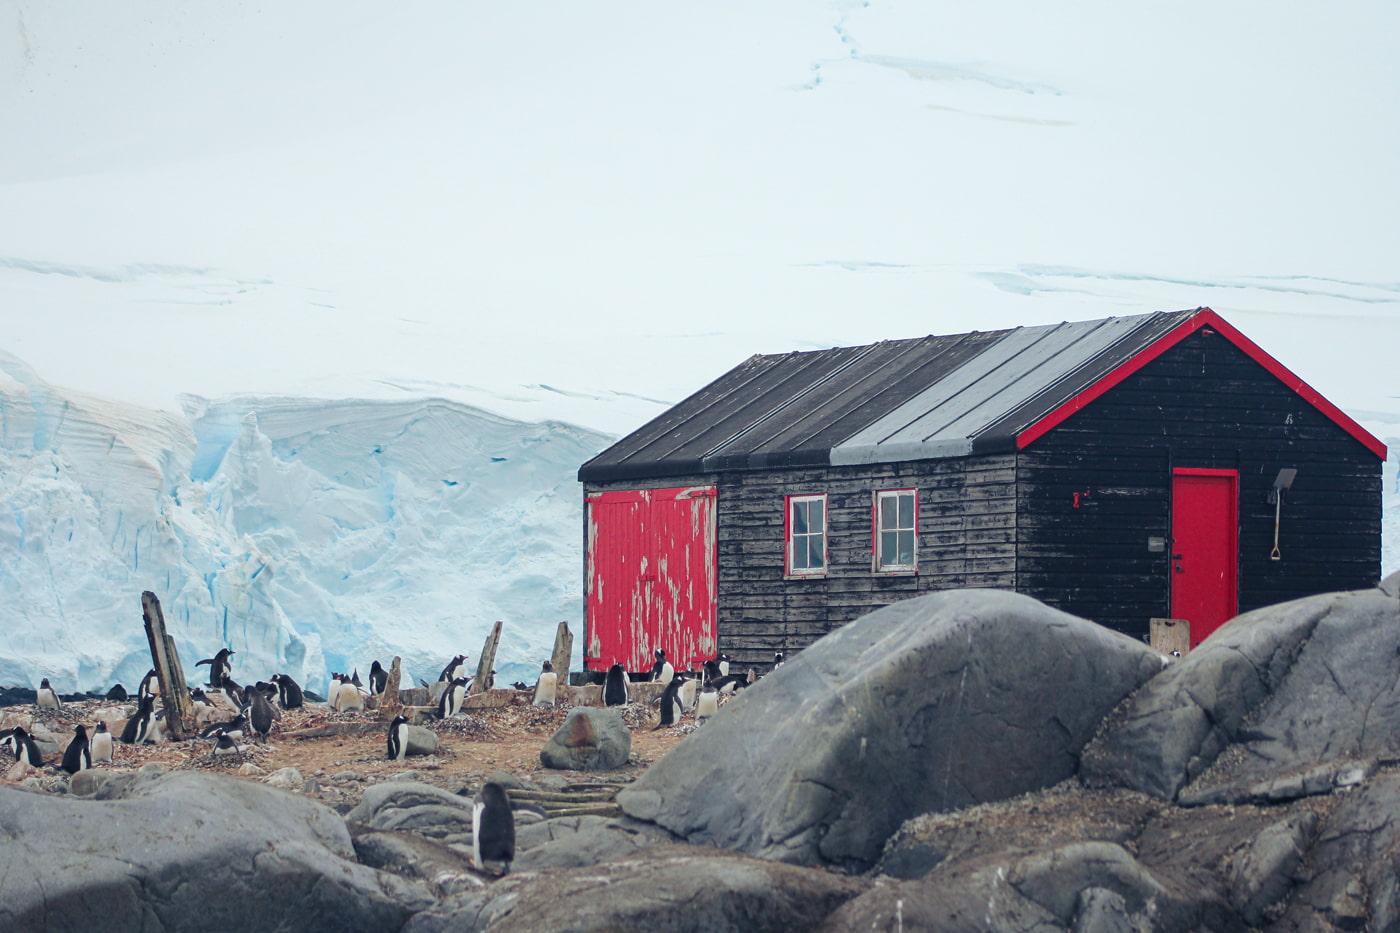 The Penguin Post Office